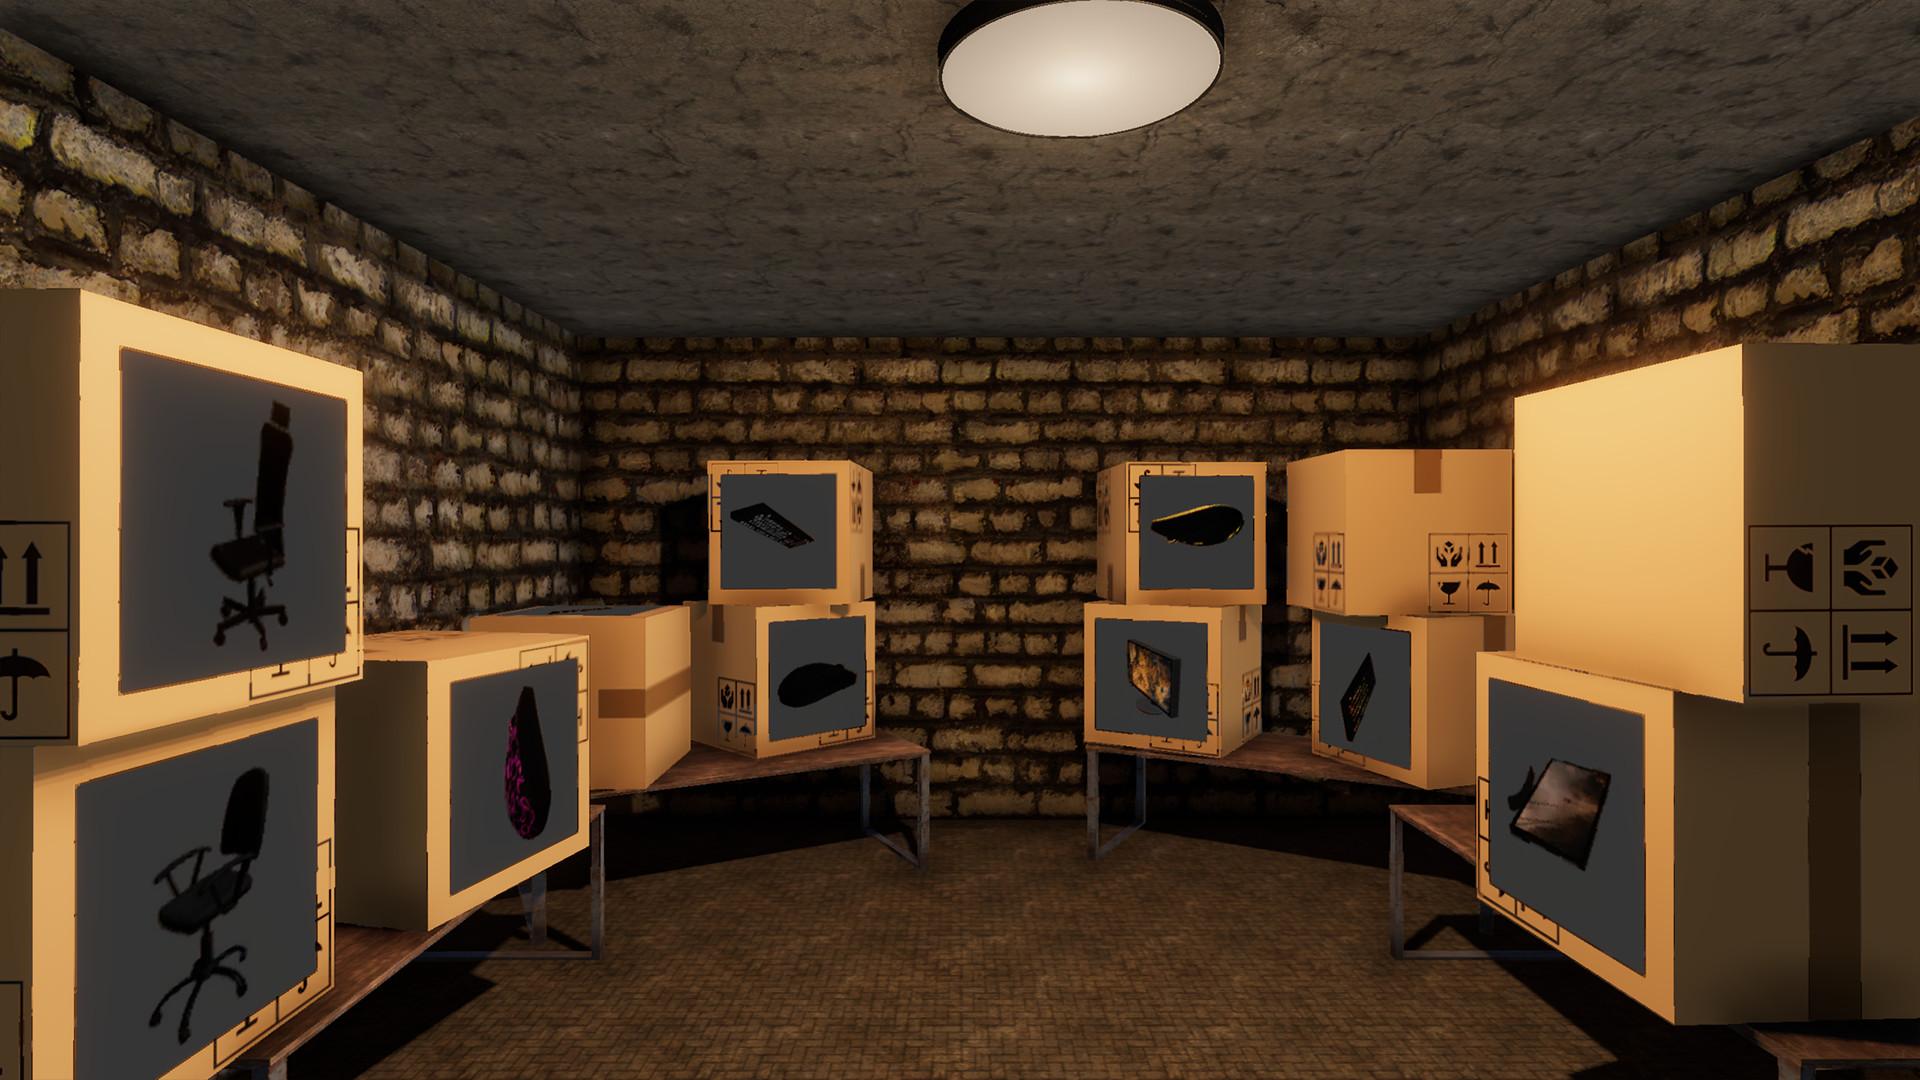 Gamer Shop Simulator Free Download